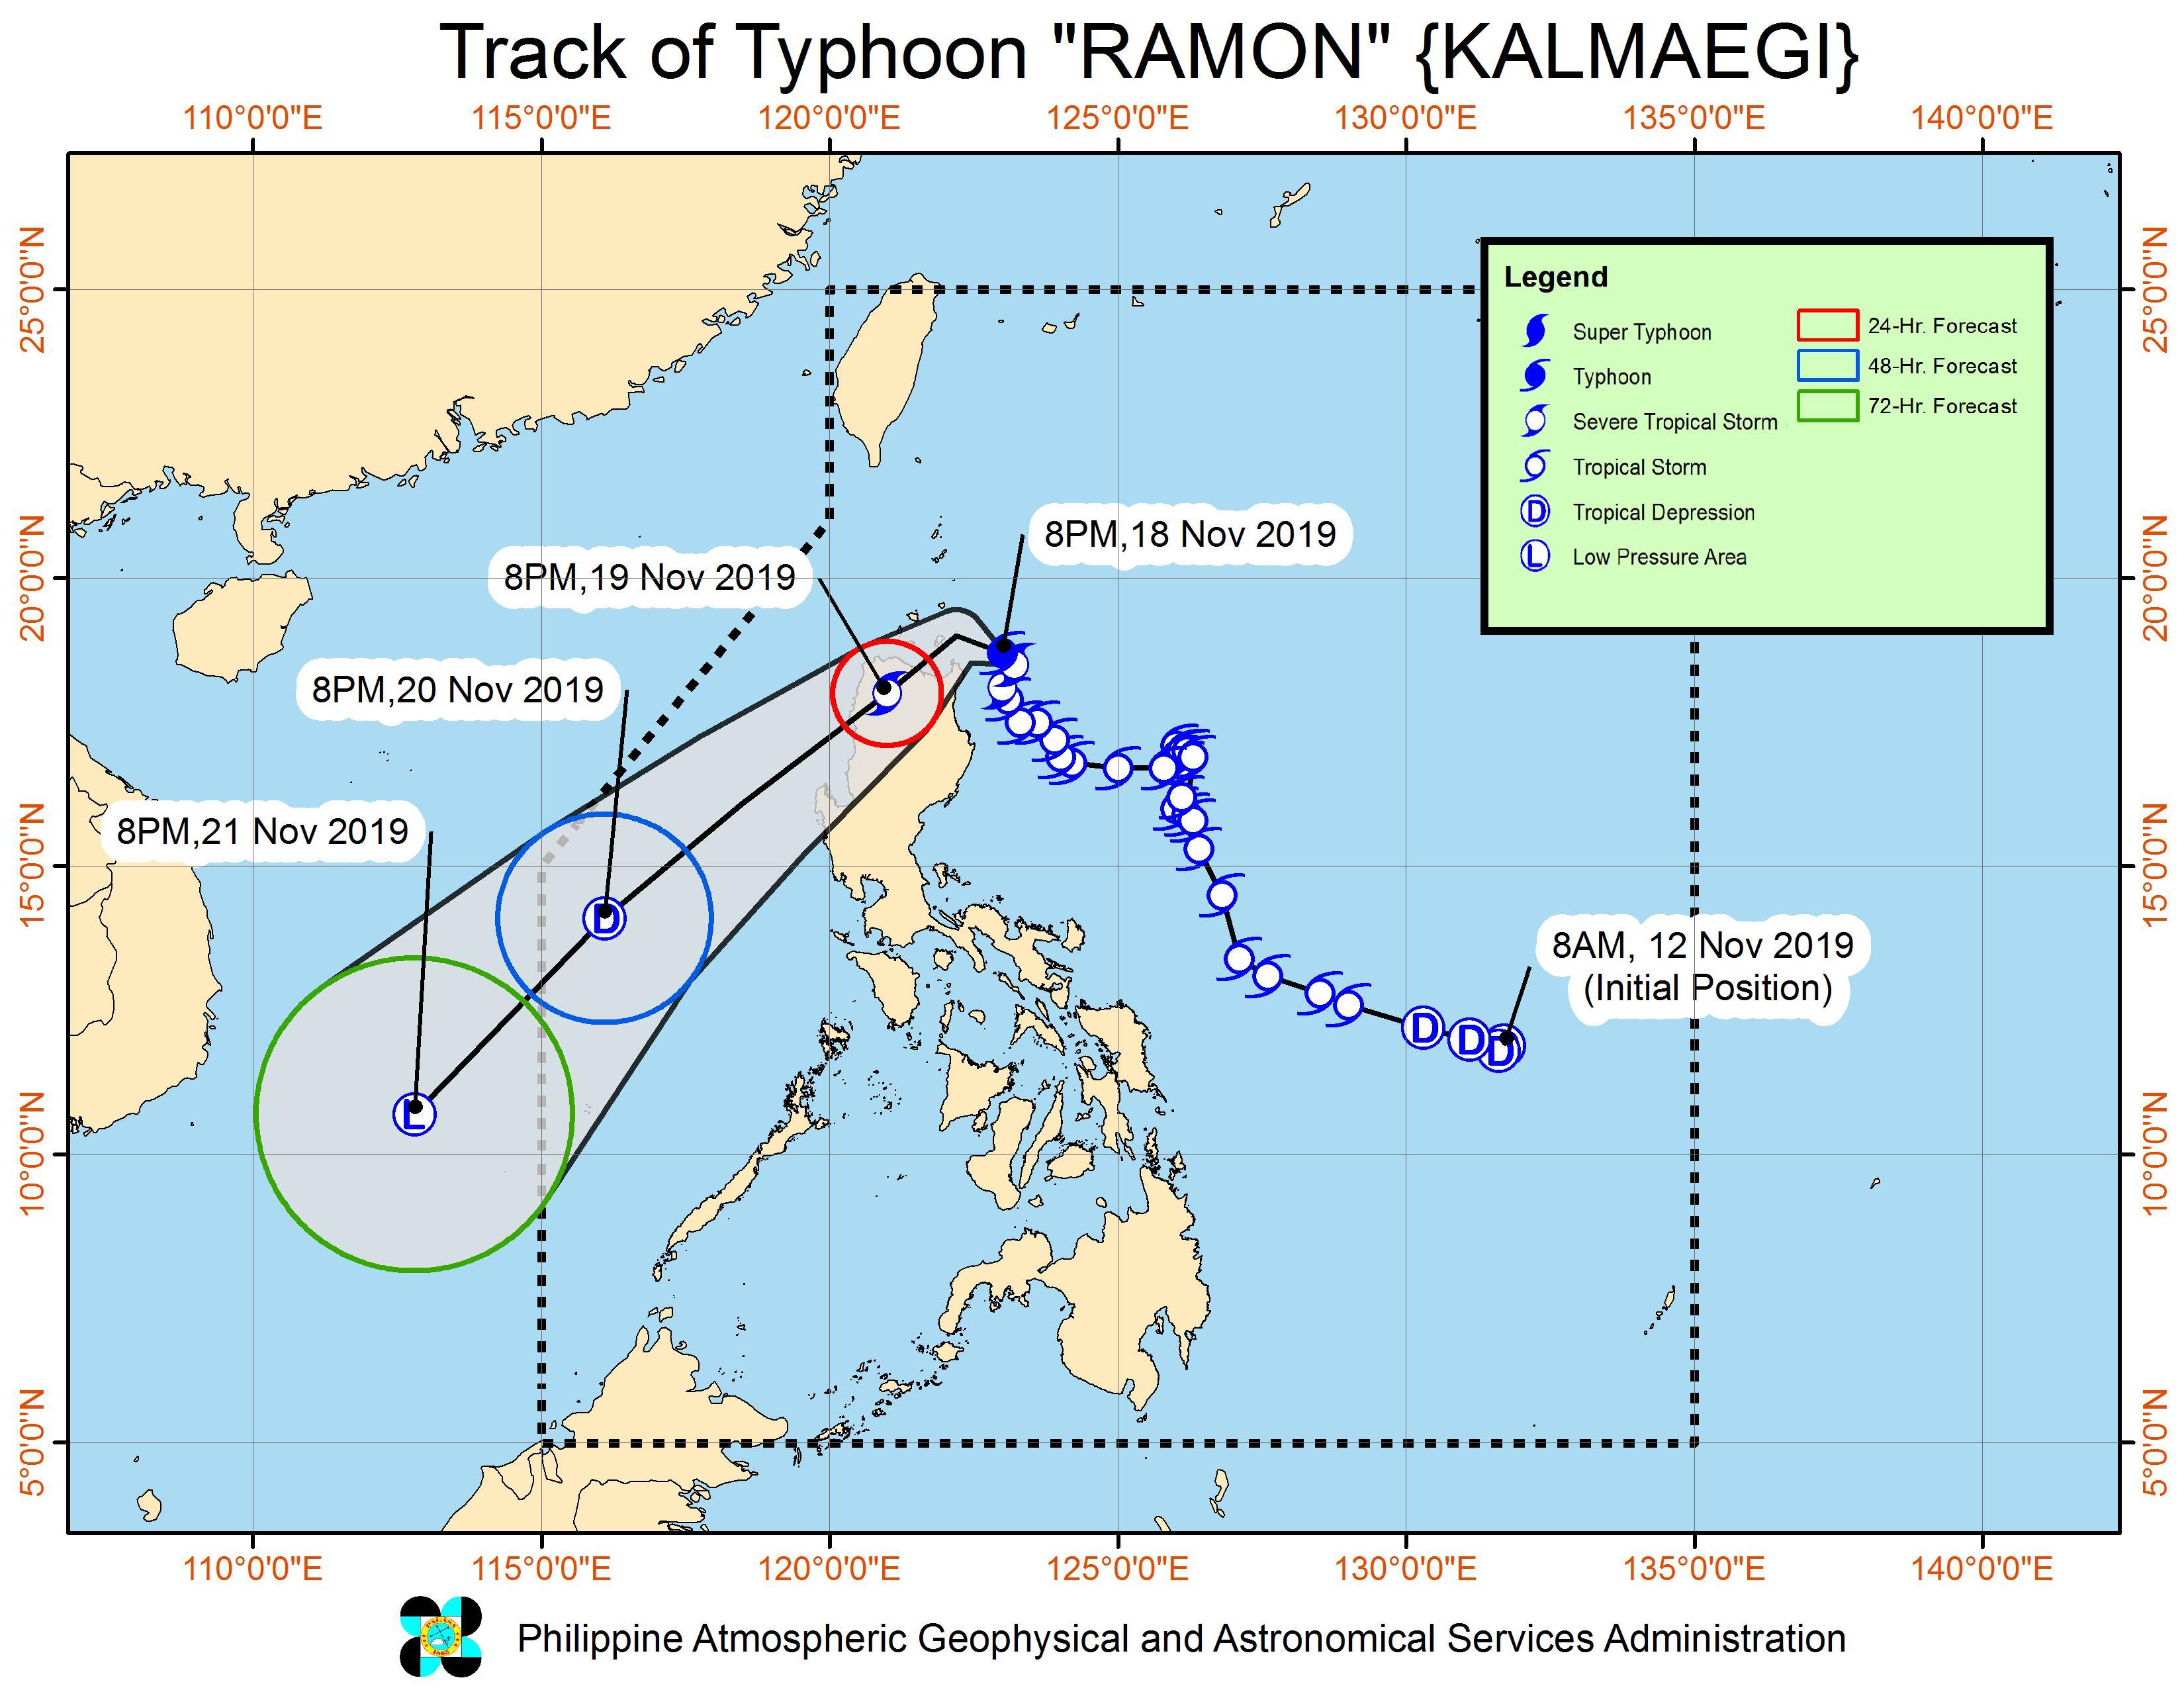 Forecast track of Typhoon Ramon (Kalmaegi) as of November 18, 2019, 11 pm. Image from PAGASA